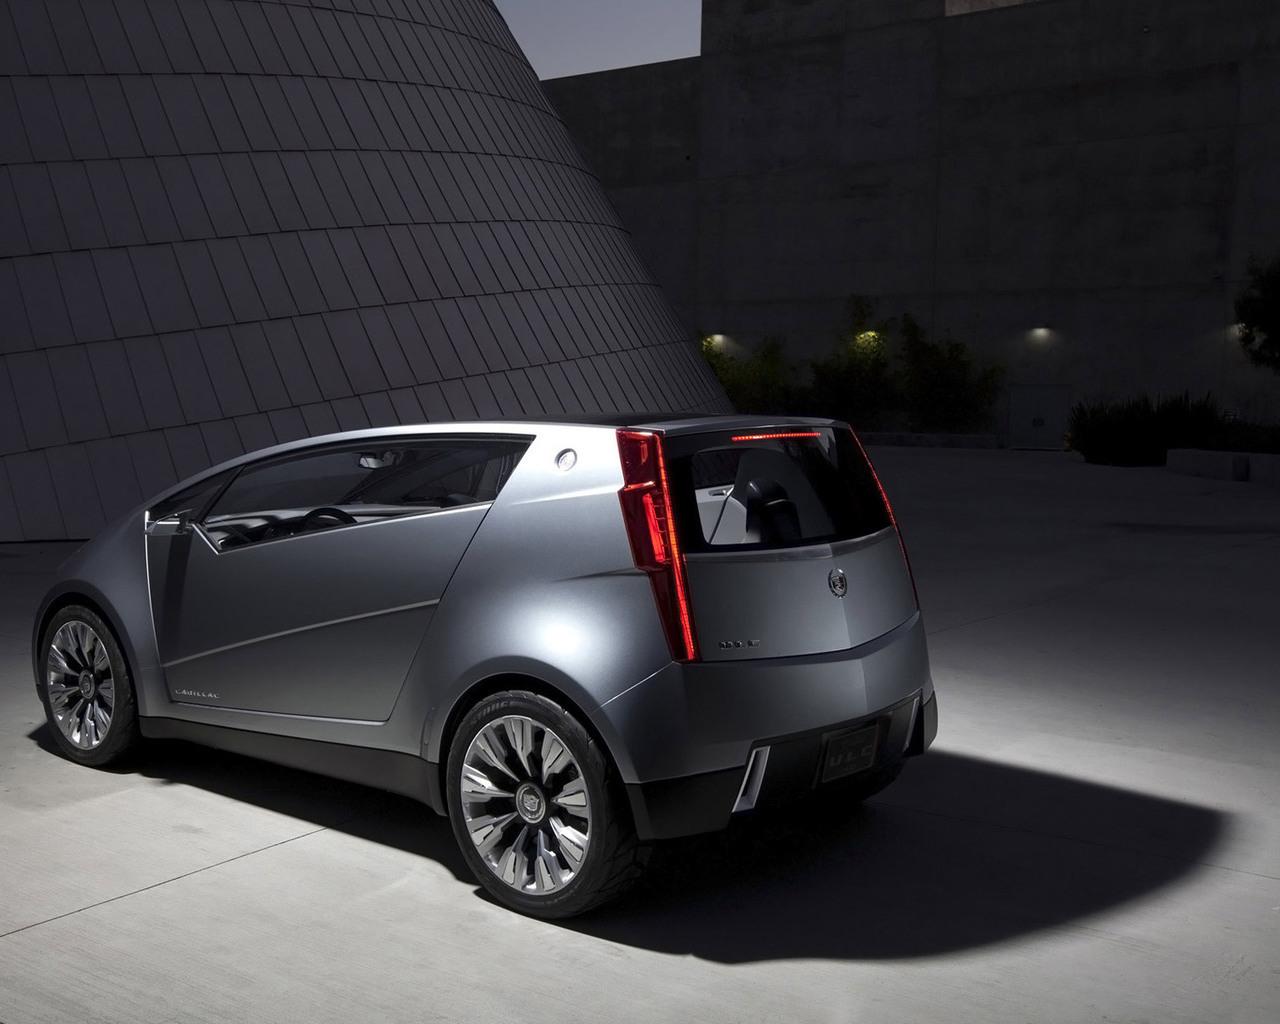 Cadillac, Urban Luxury Concept, 2010 гламурные обои